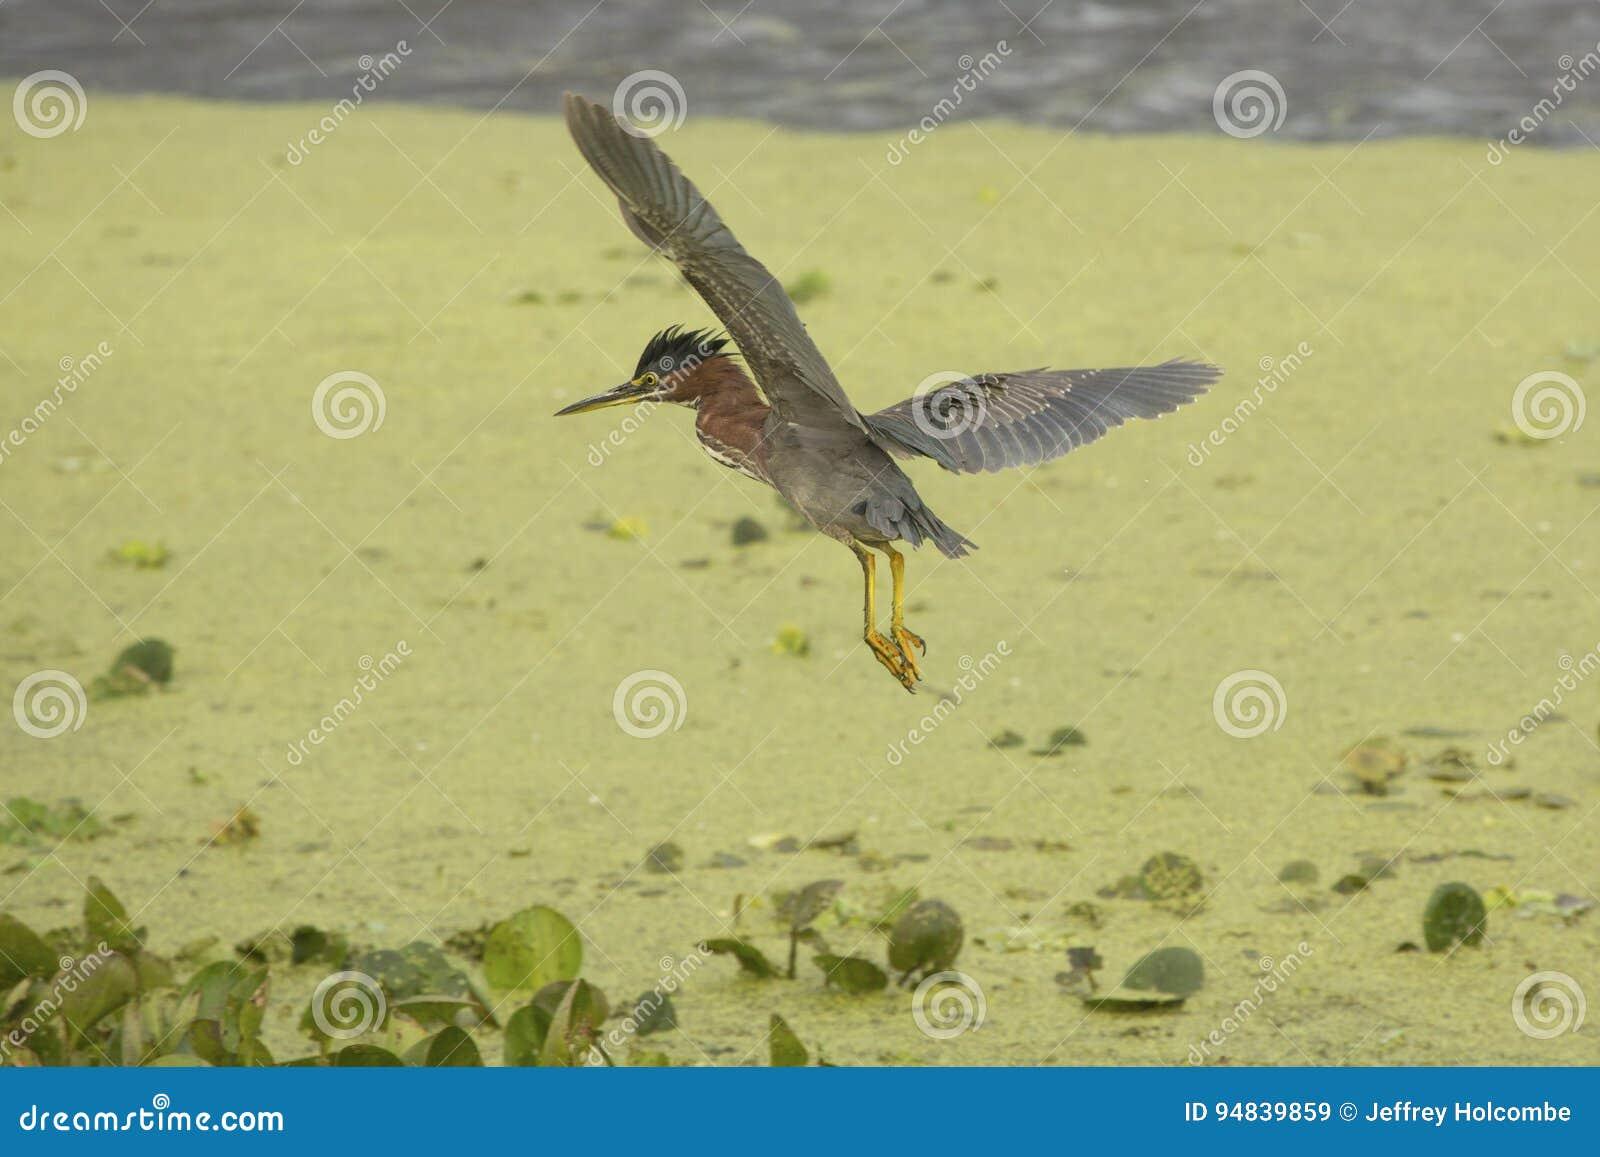 Little green heron flying over swamp vegetation in Florida.